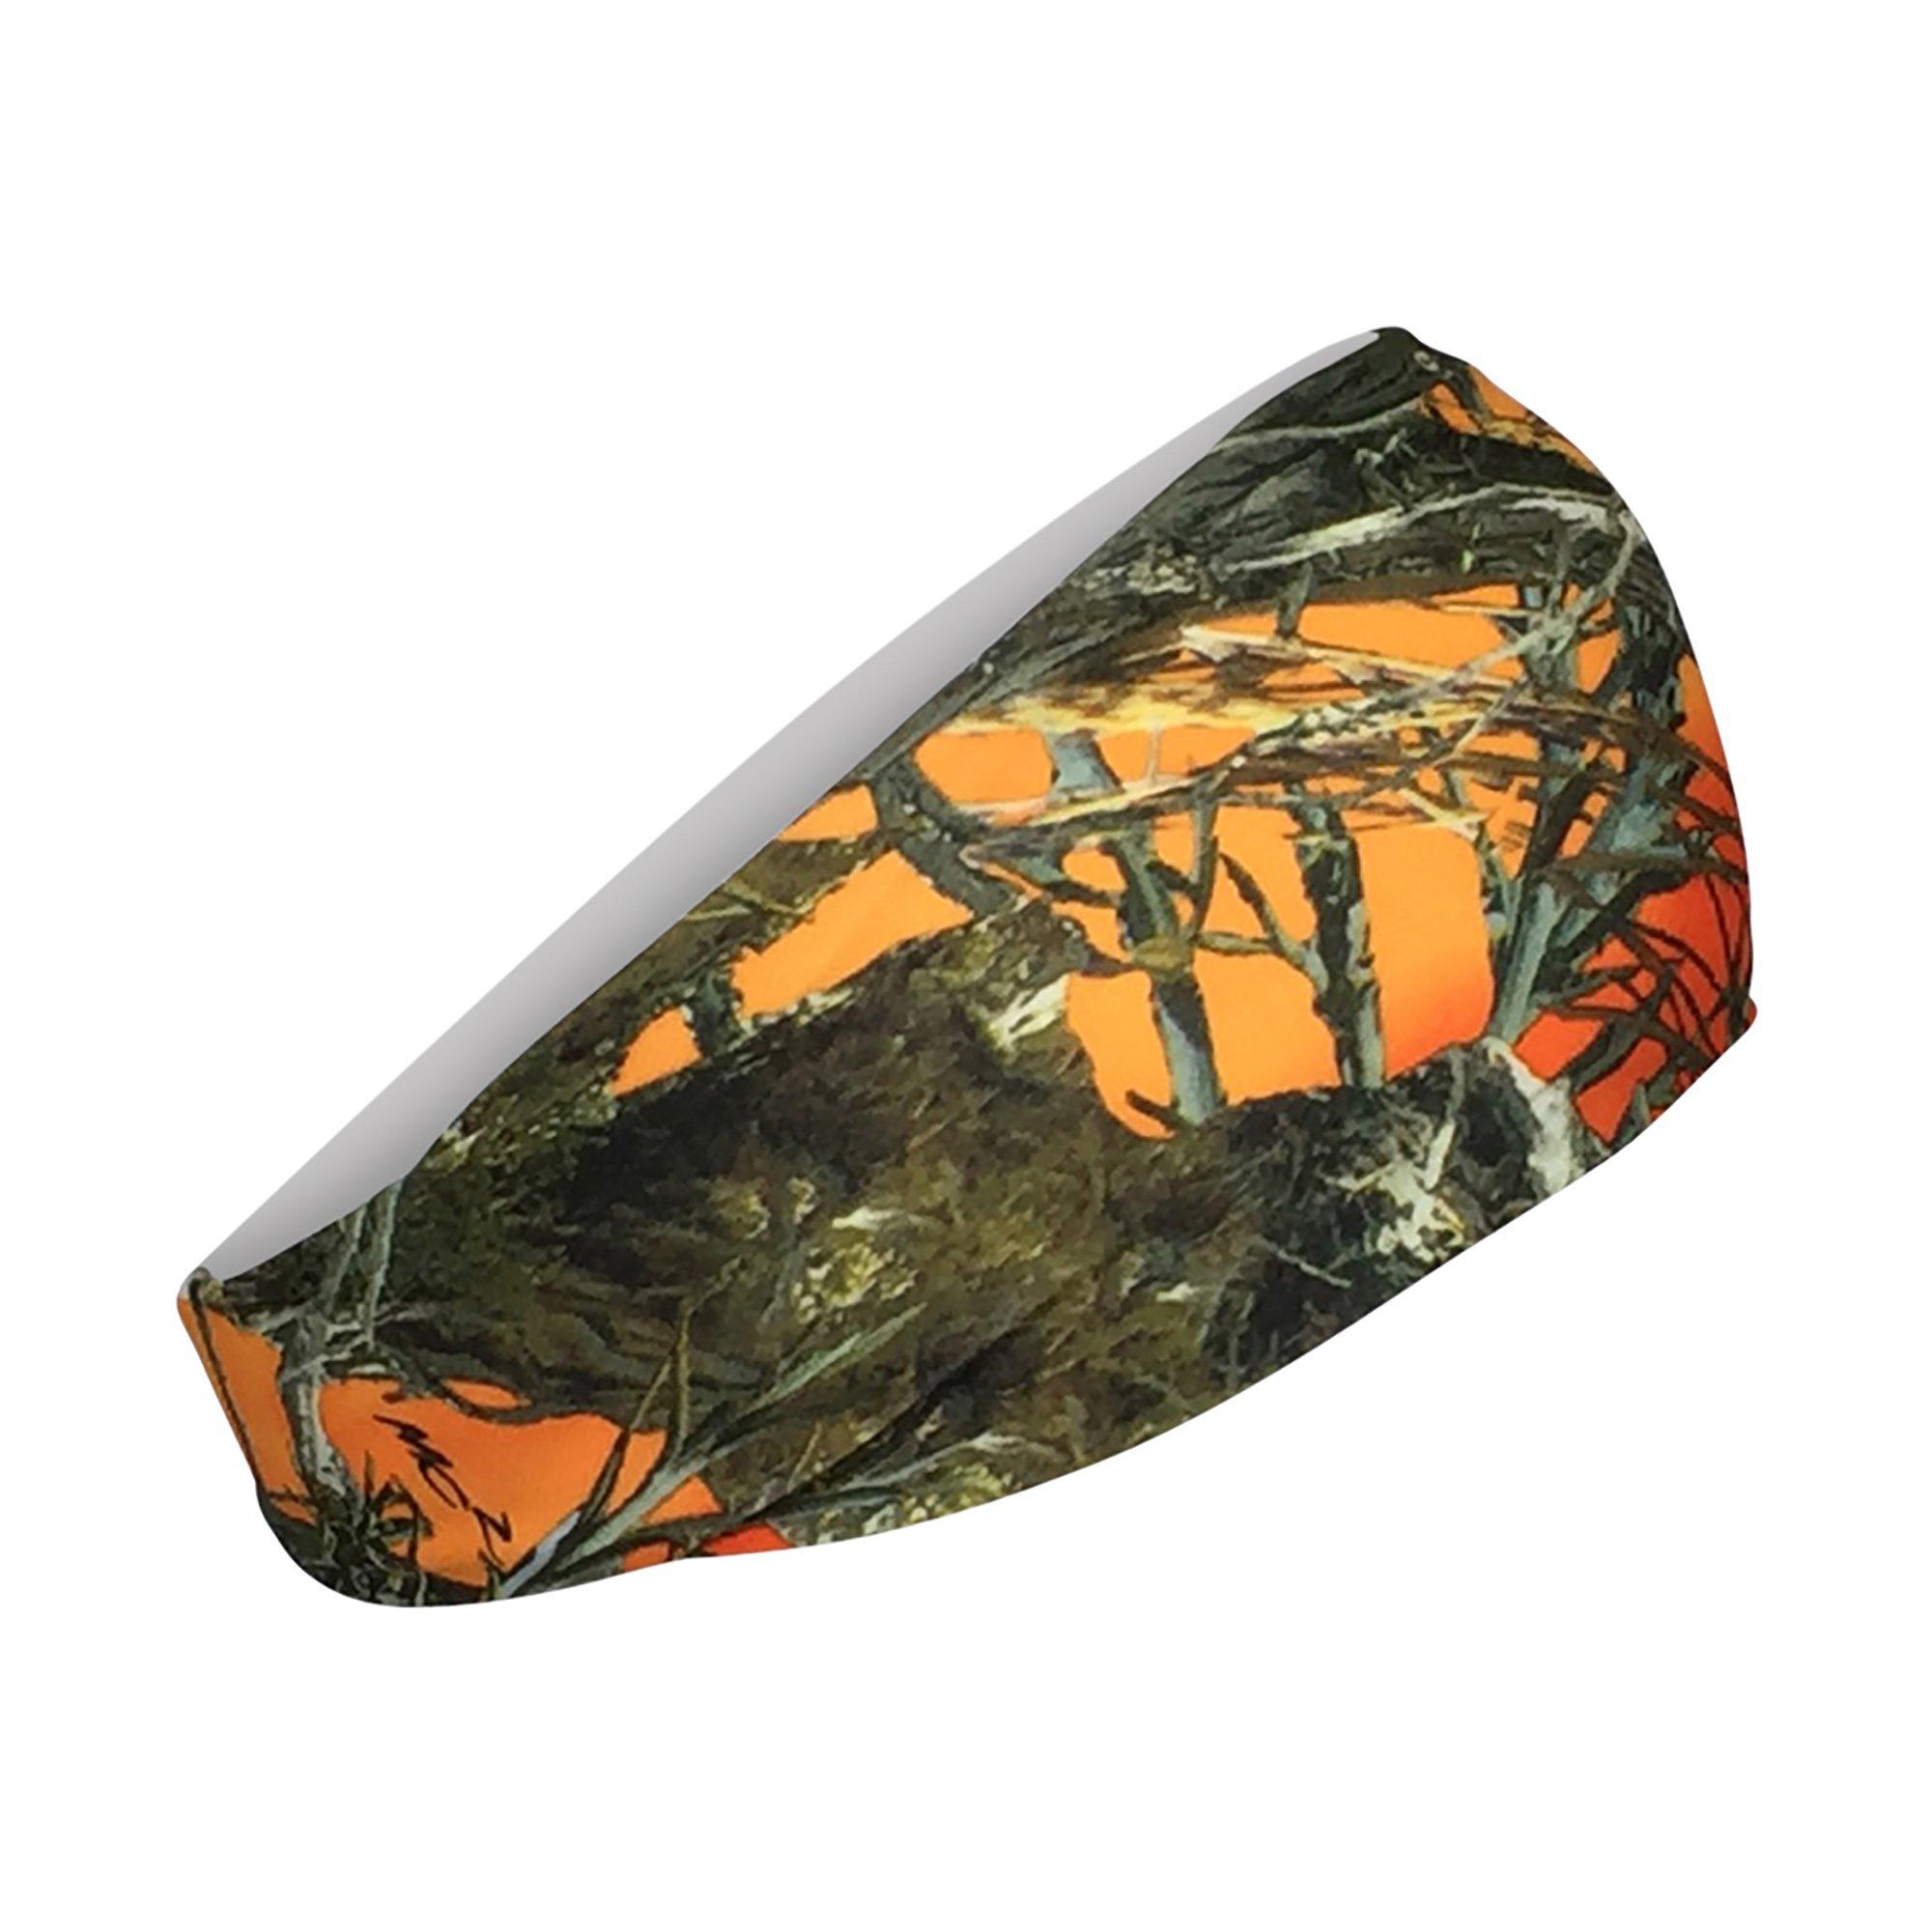 Cooling Headbands Moisture Wicking Womens Sweatband & Sports Headband | Workouts Cardio Running Yoga (Orange Camo) by Bani Bands (Image #2)